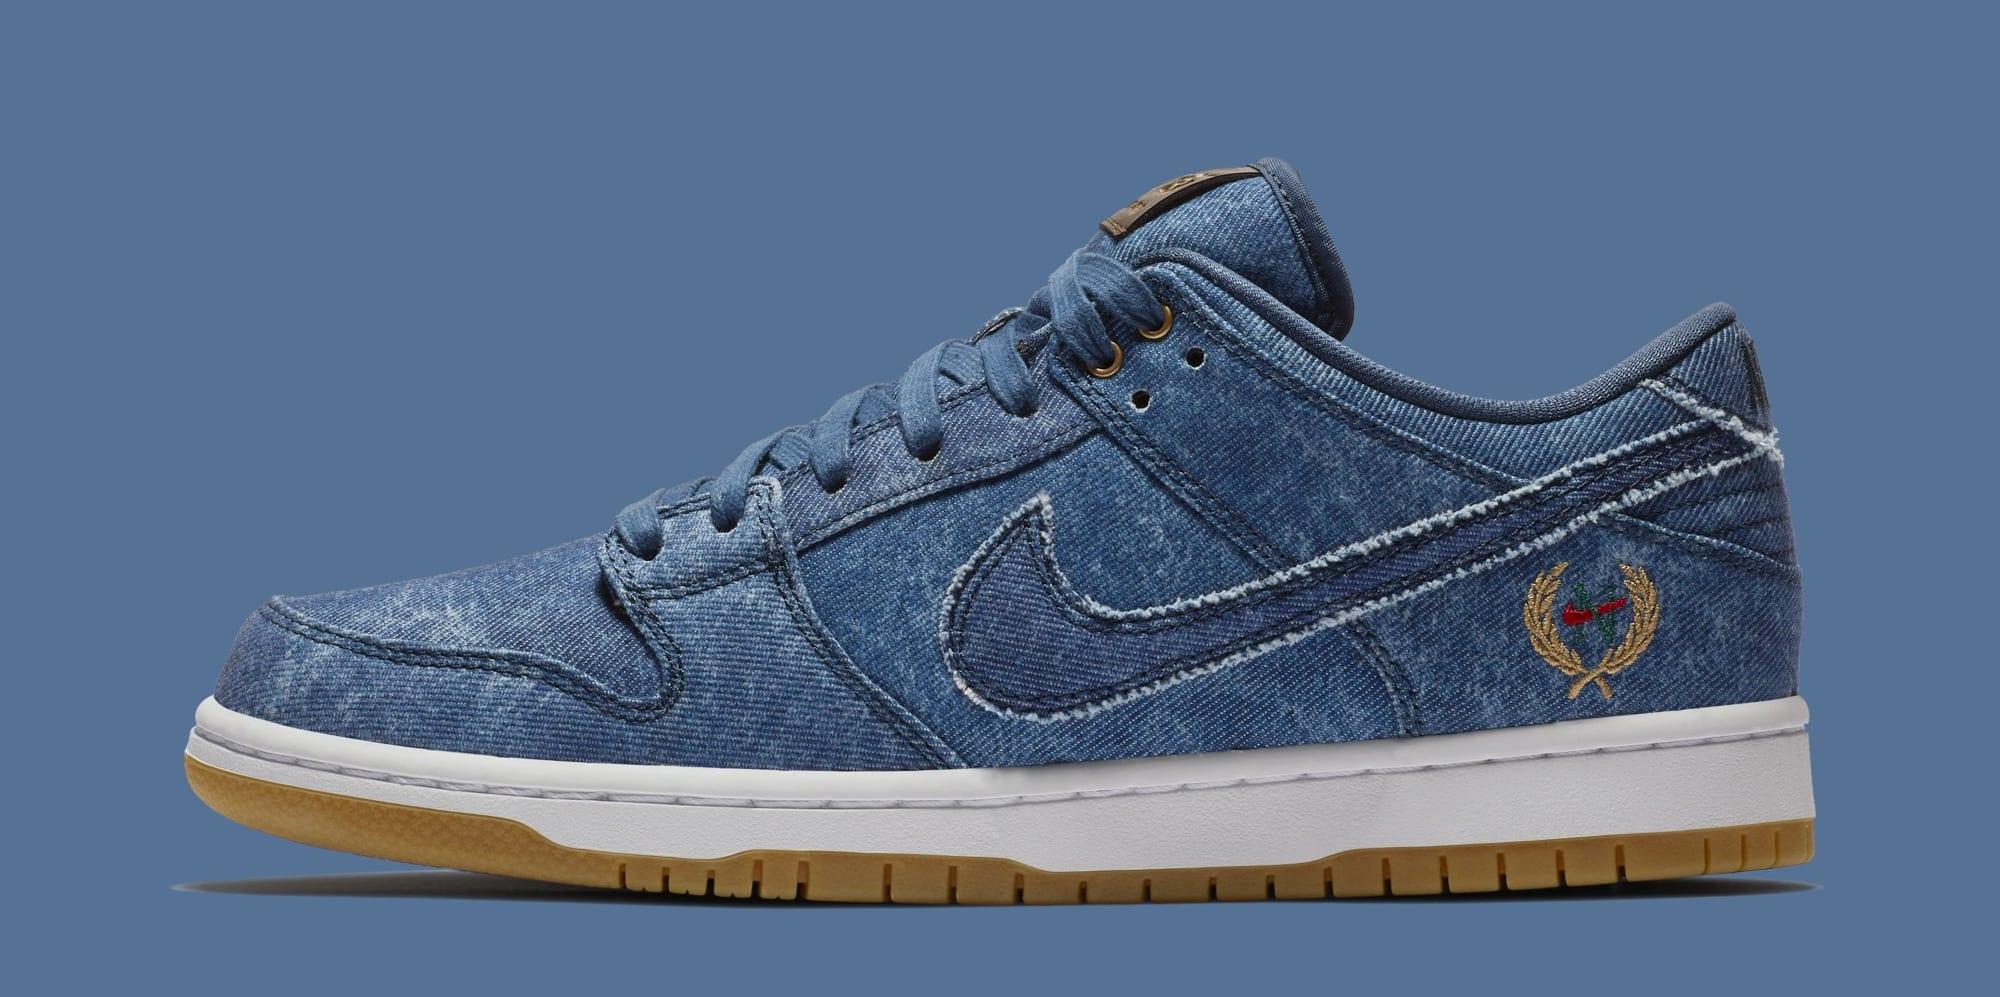 Nike SB Dunk Low 'Biggie' 883232-441 (Lateral)